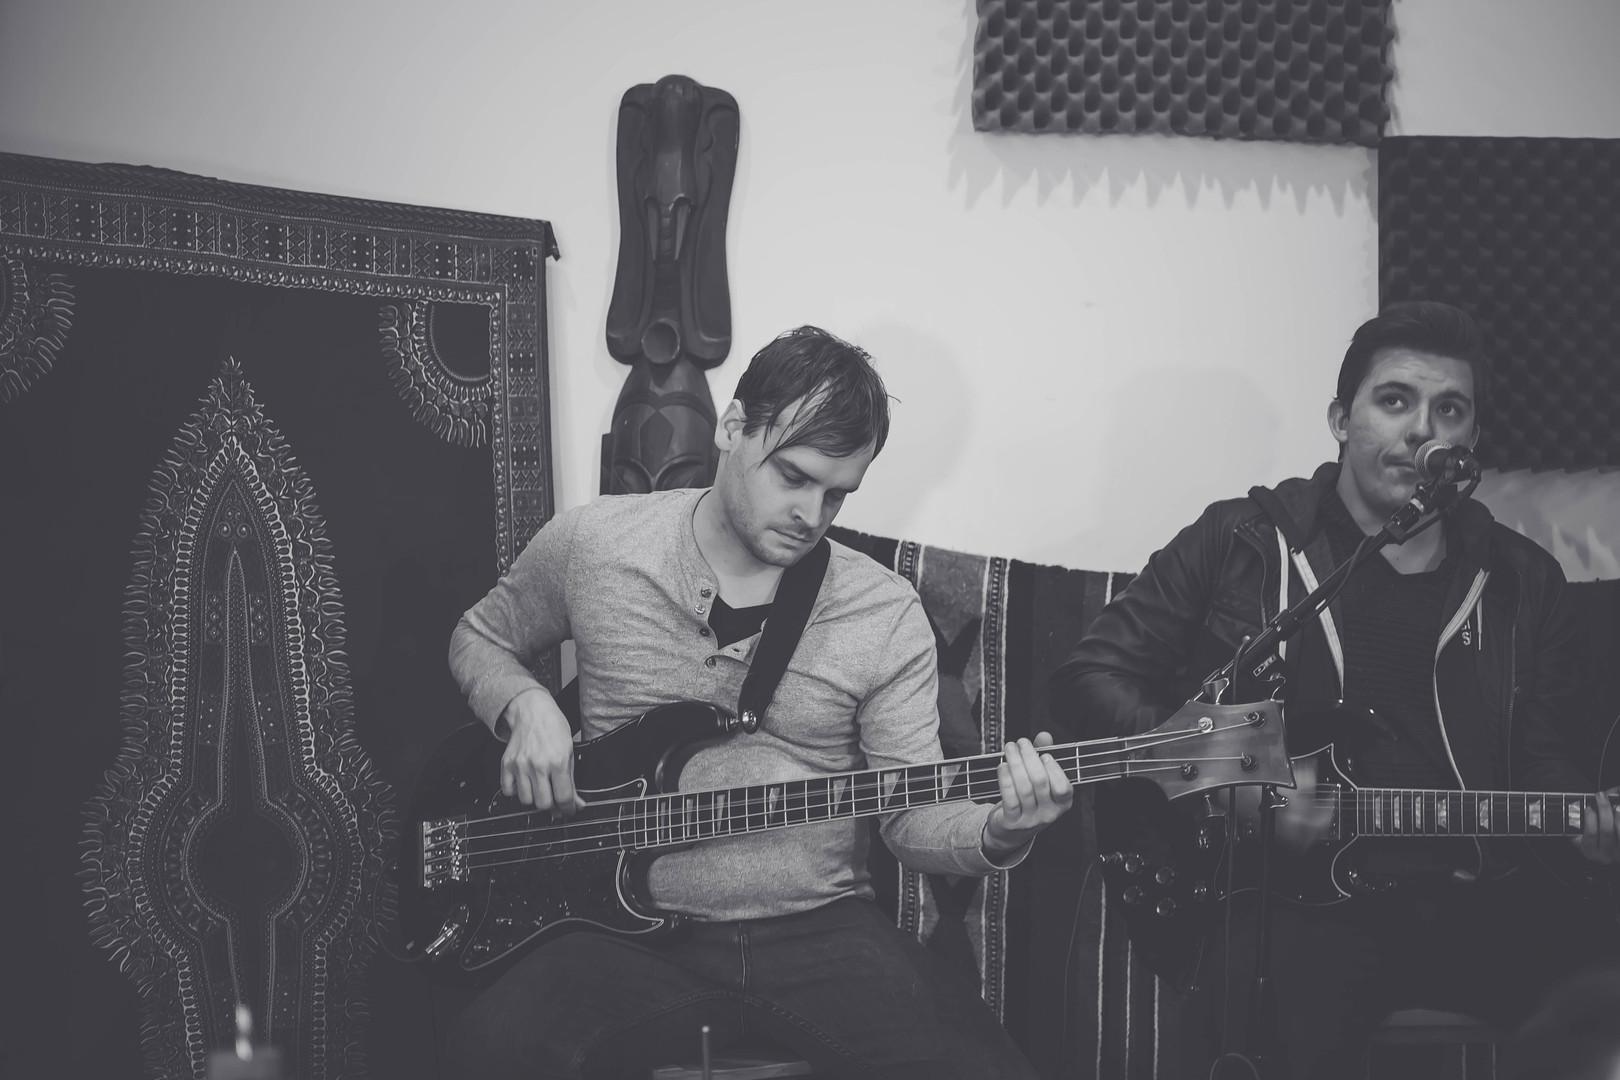 Ryan Krease and Andy Doran